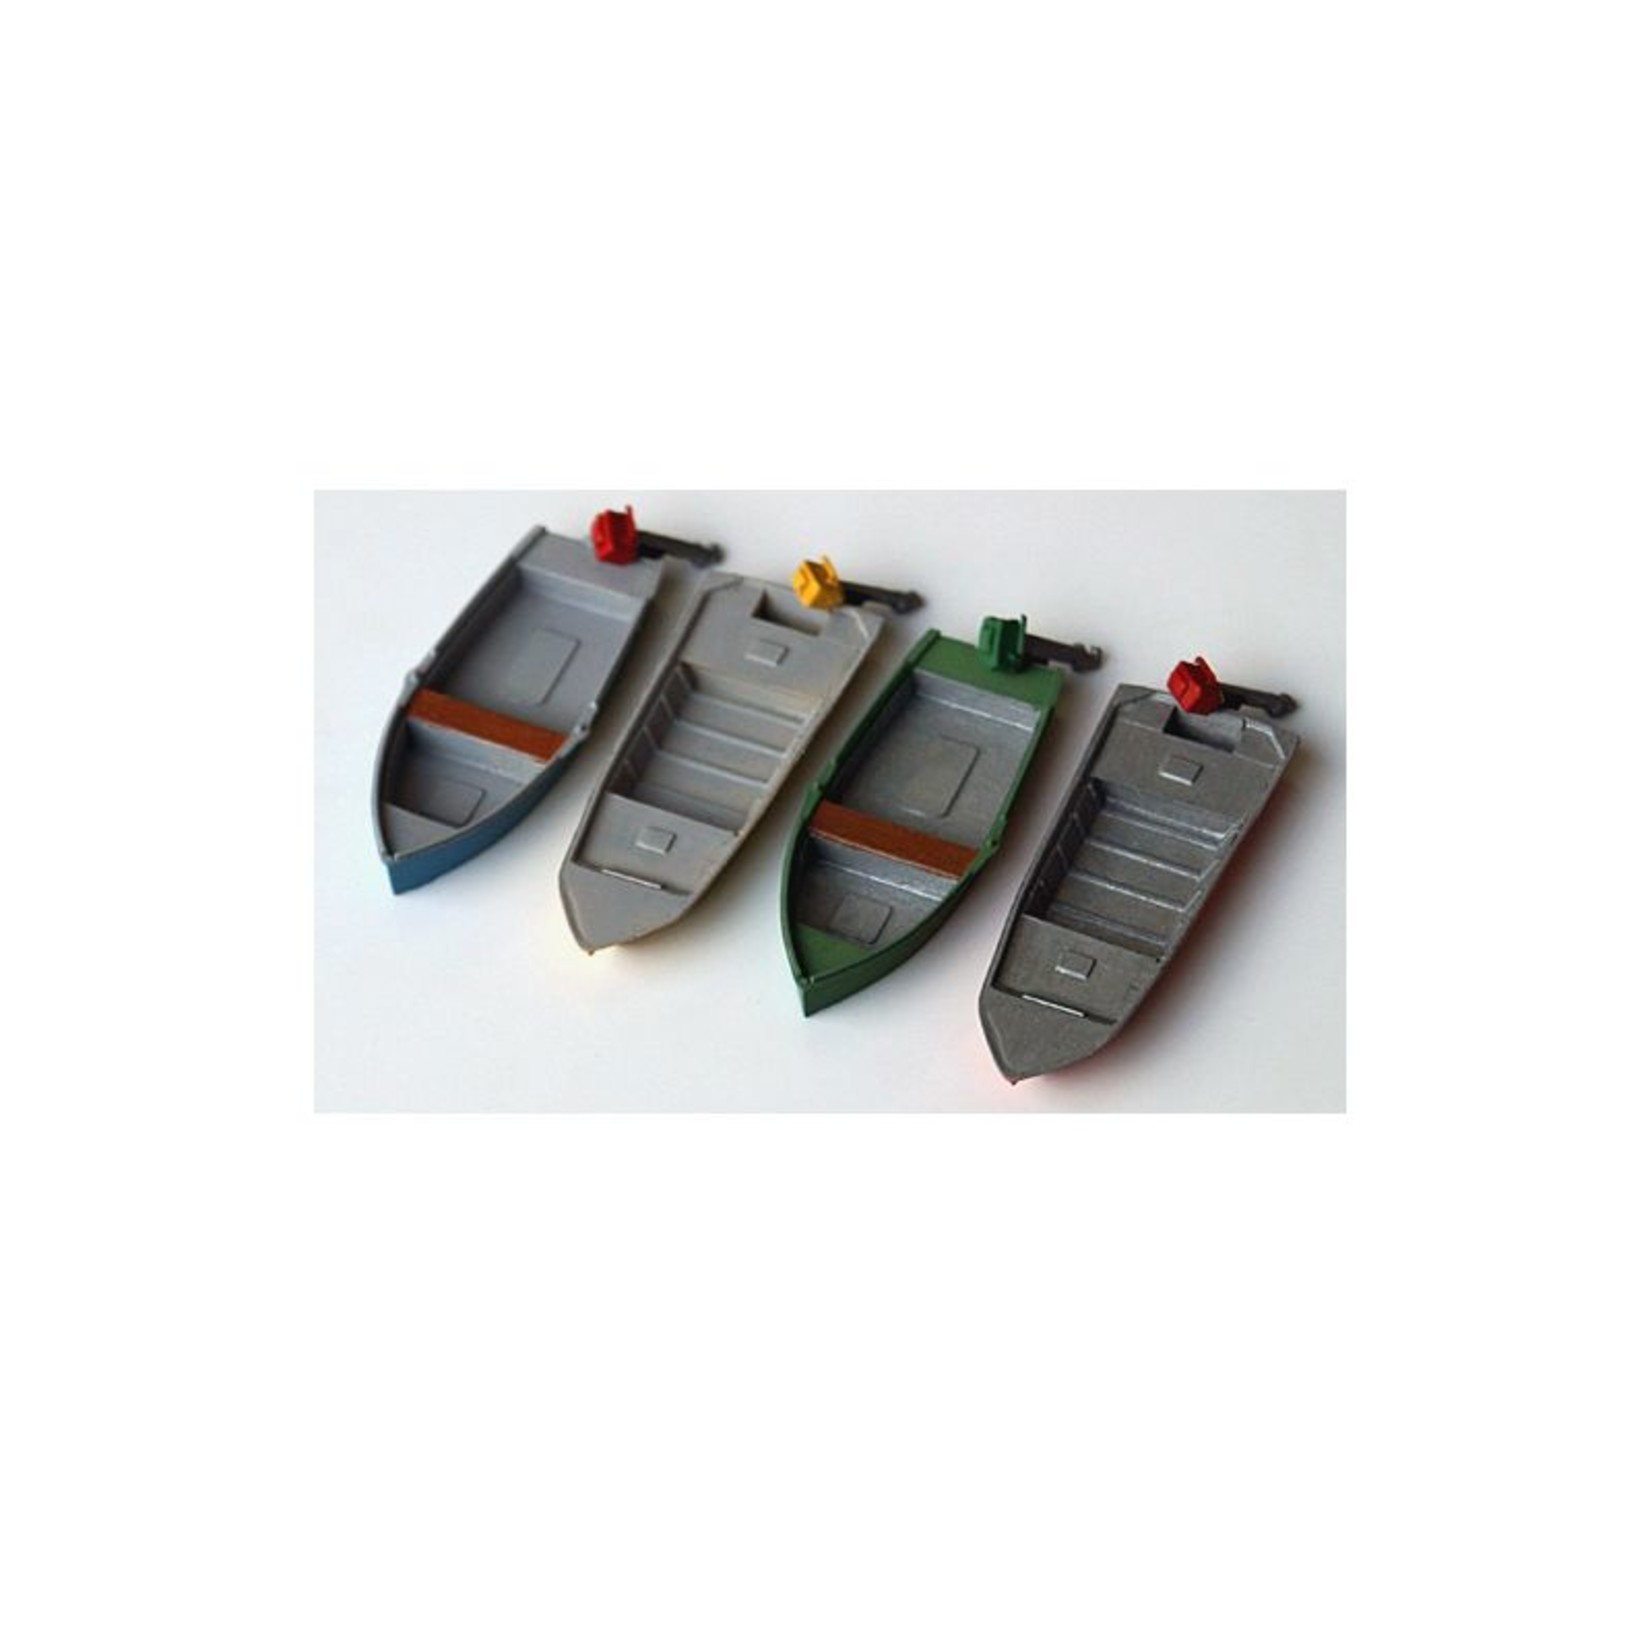 4 pcs Sport fishing boats